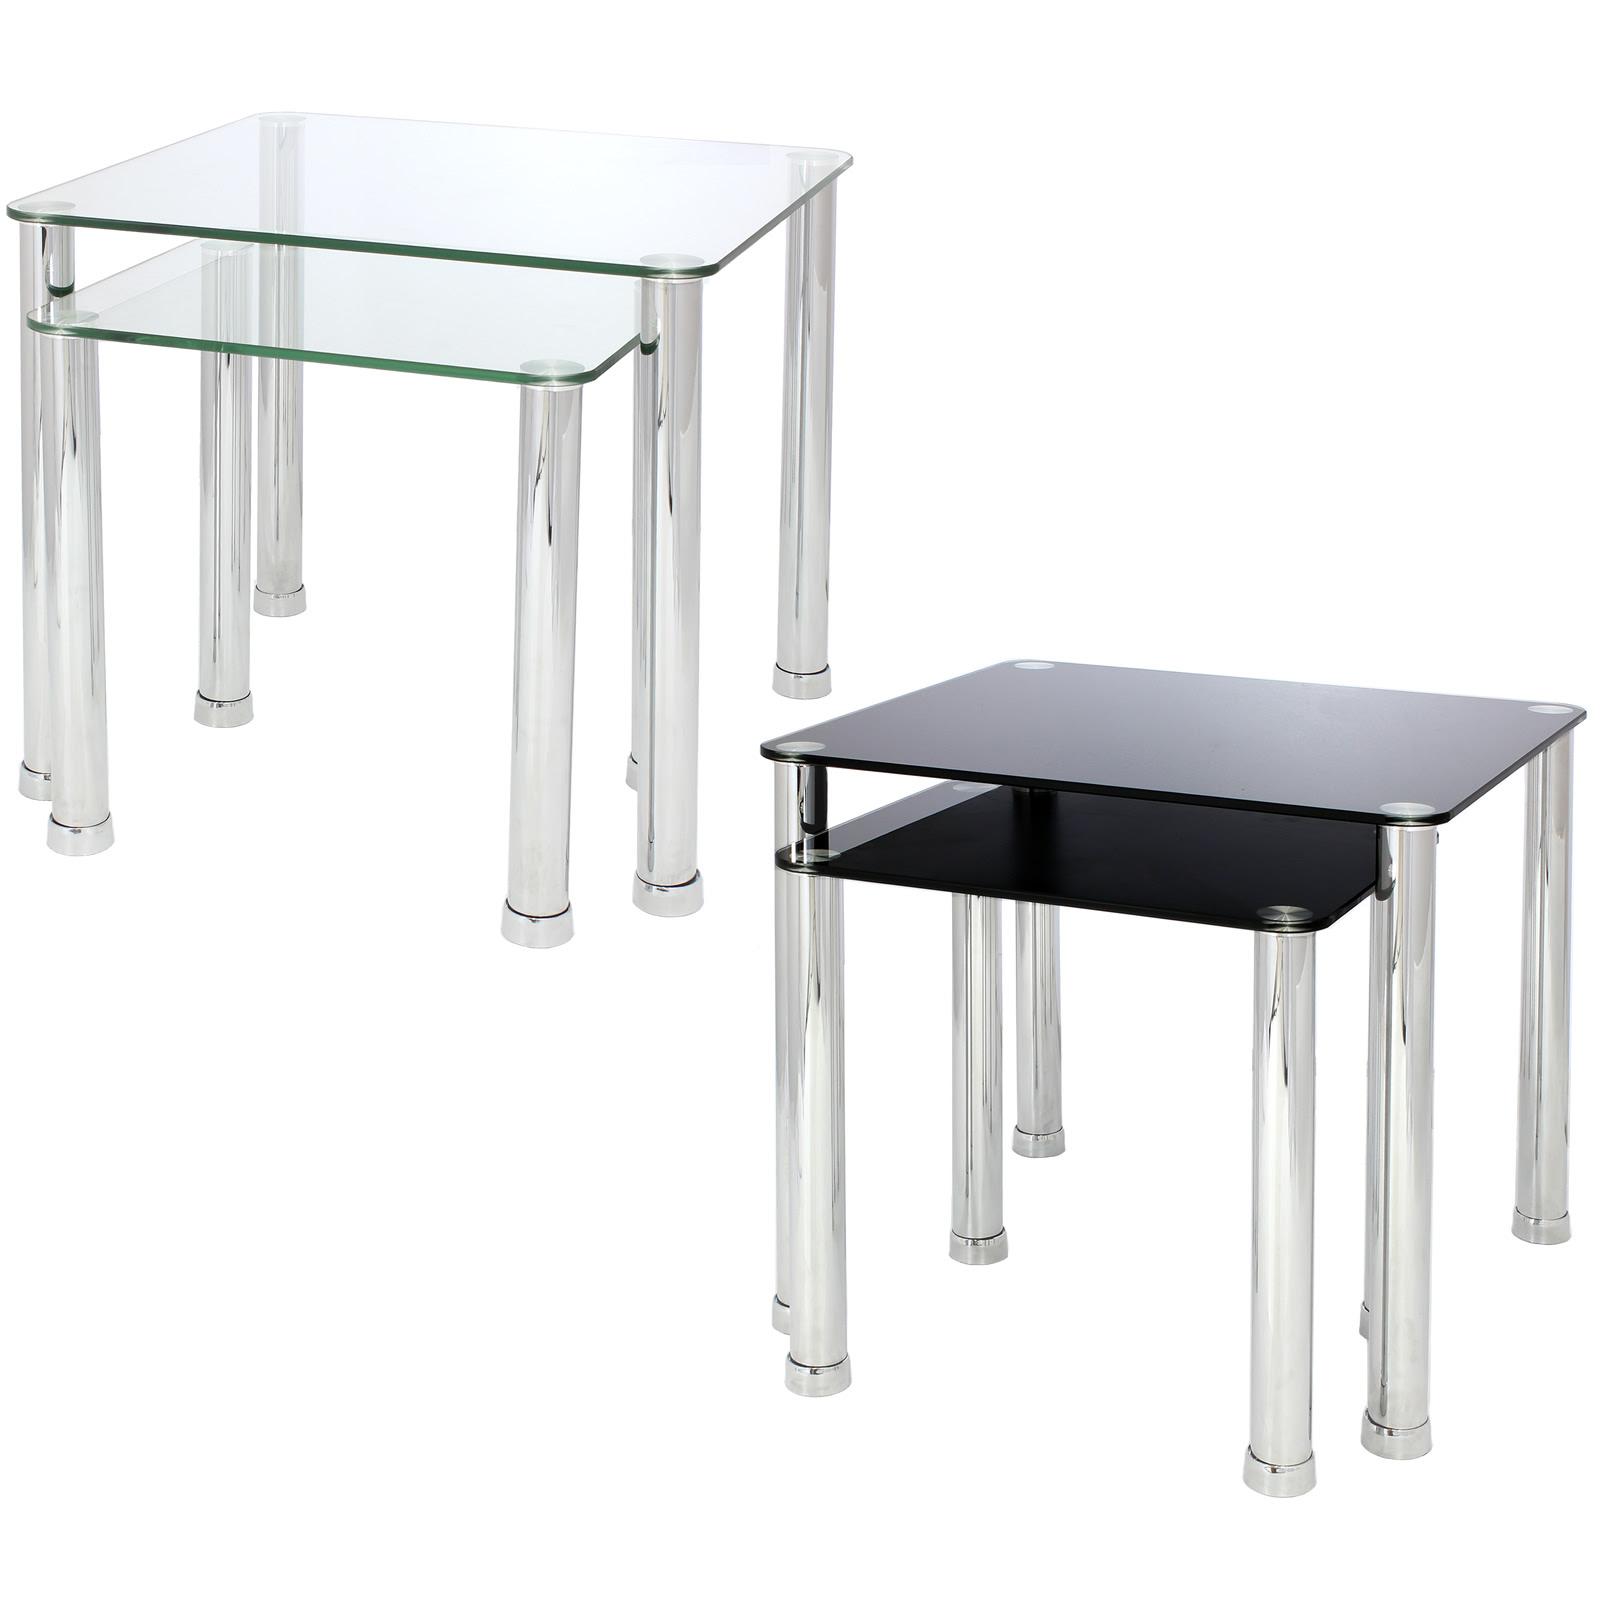 NEST OF 2 GLASS CHROME TABLES HOME/LOUNGE/LIVING ROOM SET ...